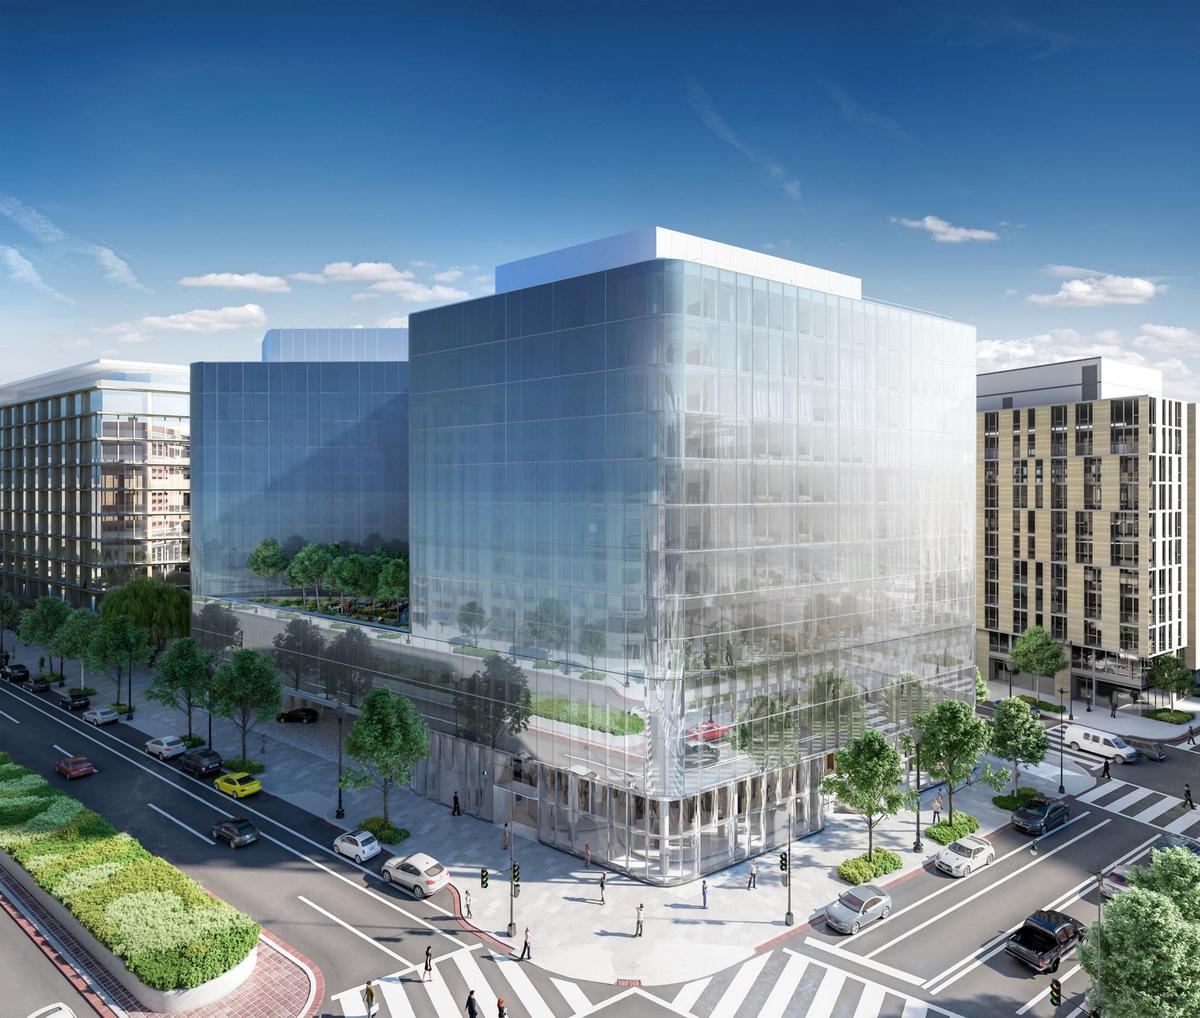 Construction begins on herzog de meuron 39 s conrad hotel for Design hotel washington dc